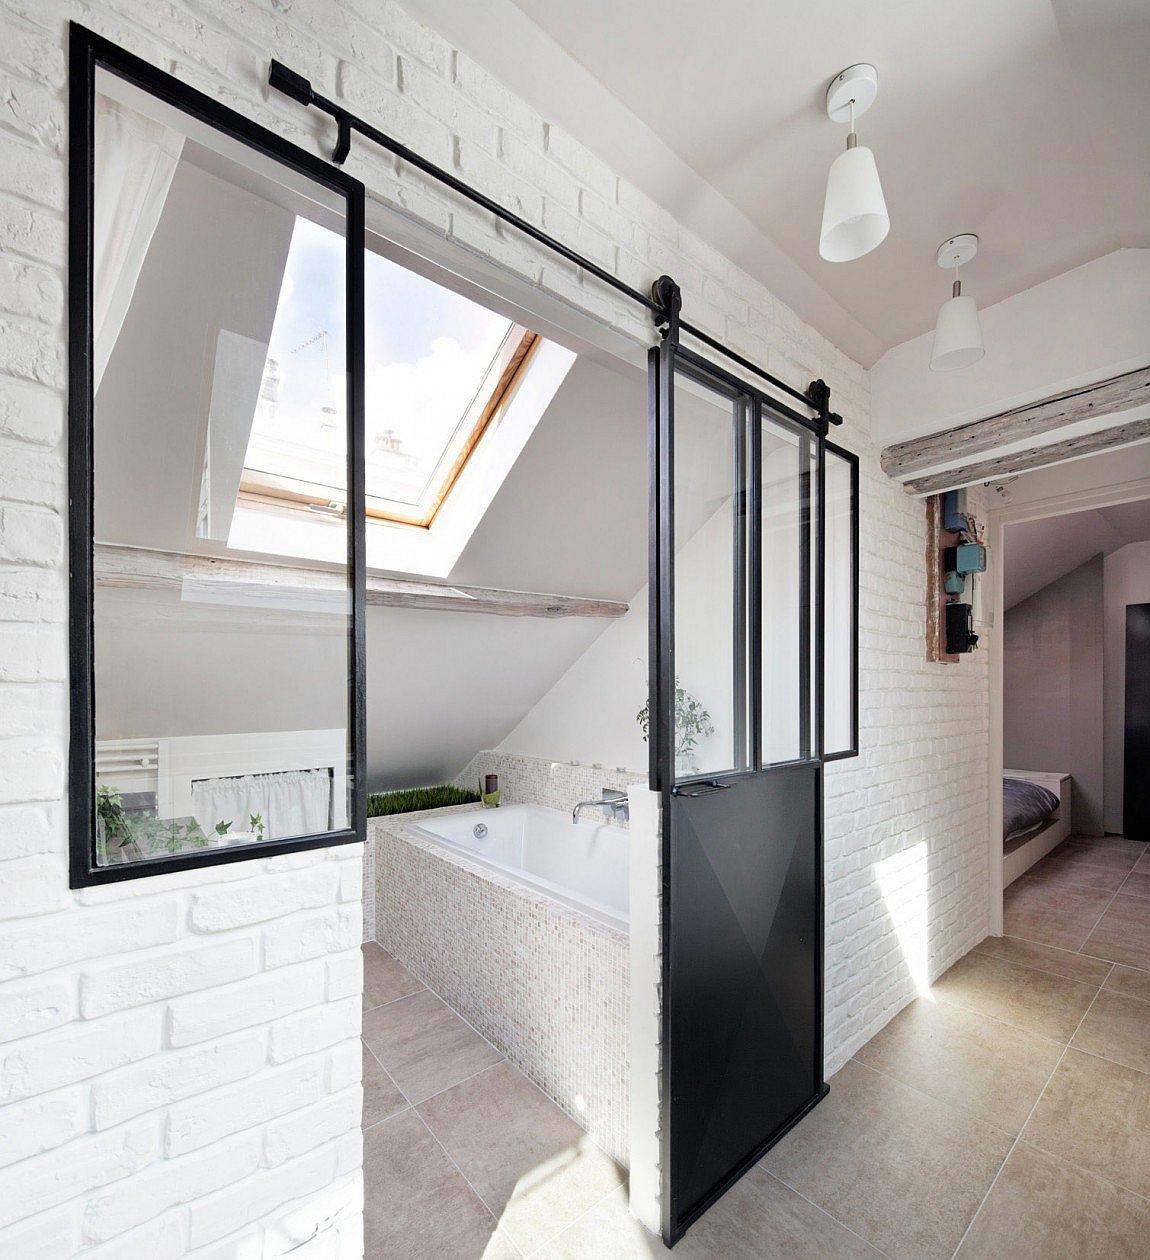 Rustic Modern Attic Apartment Renovation Oozes Parisian Panache